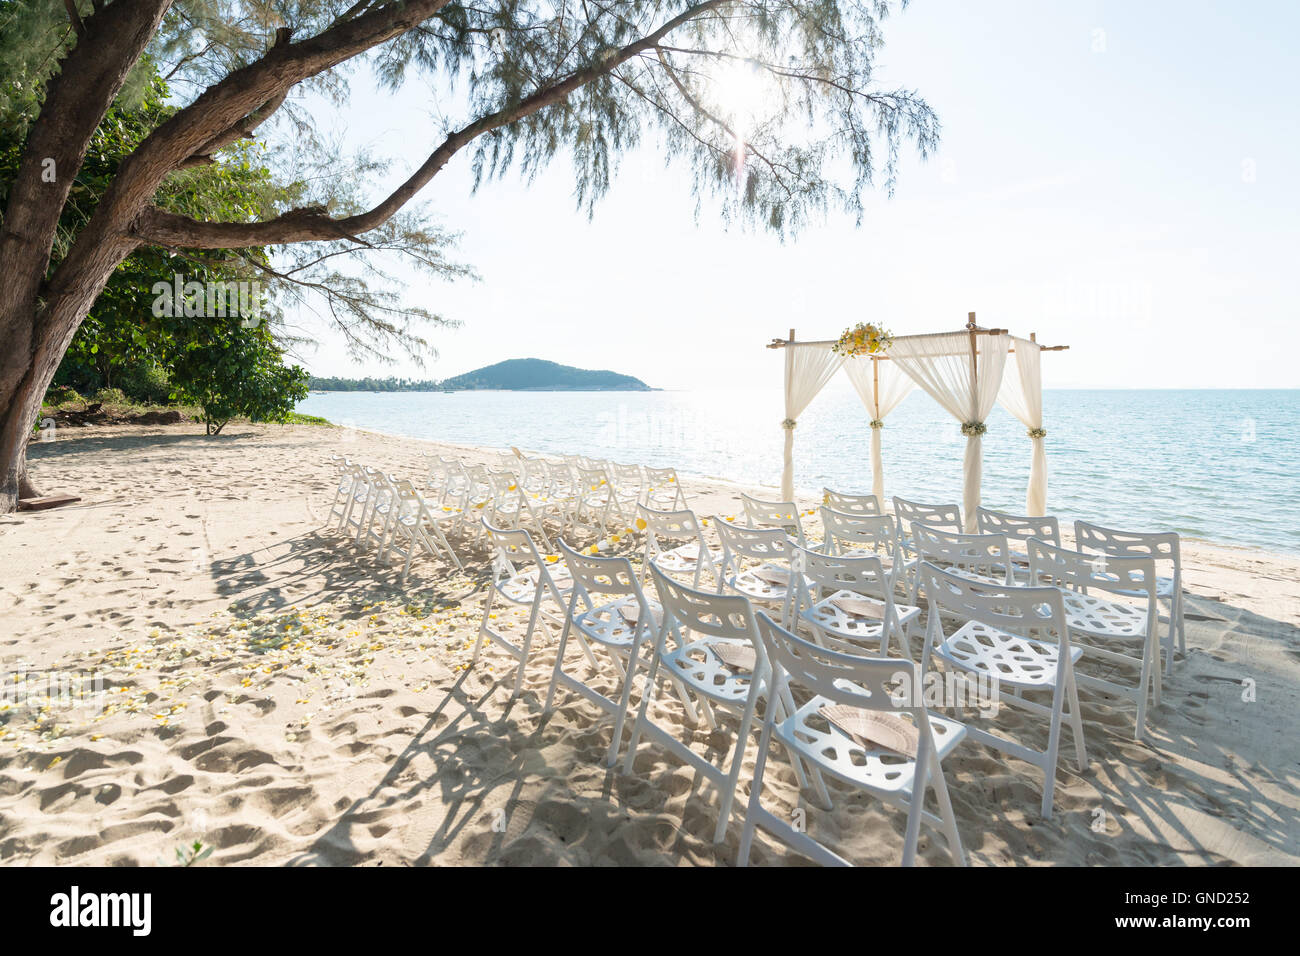 Simple style wedding arch and decoration venue setup on tropical simple style wedding arch and decoration venue setup on tropical beach outdoor beach wedding junglespirit Gallery